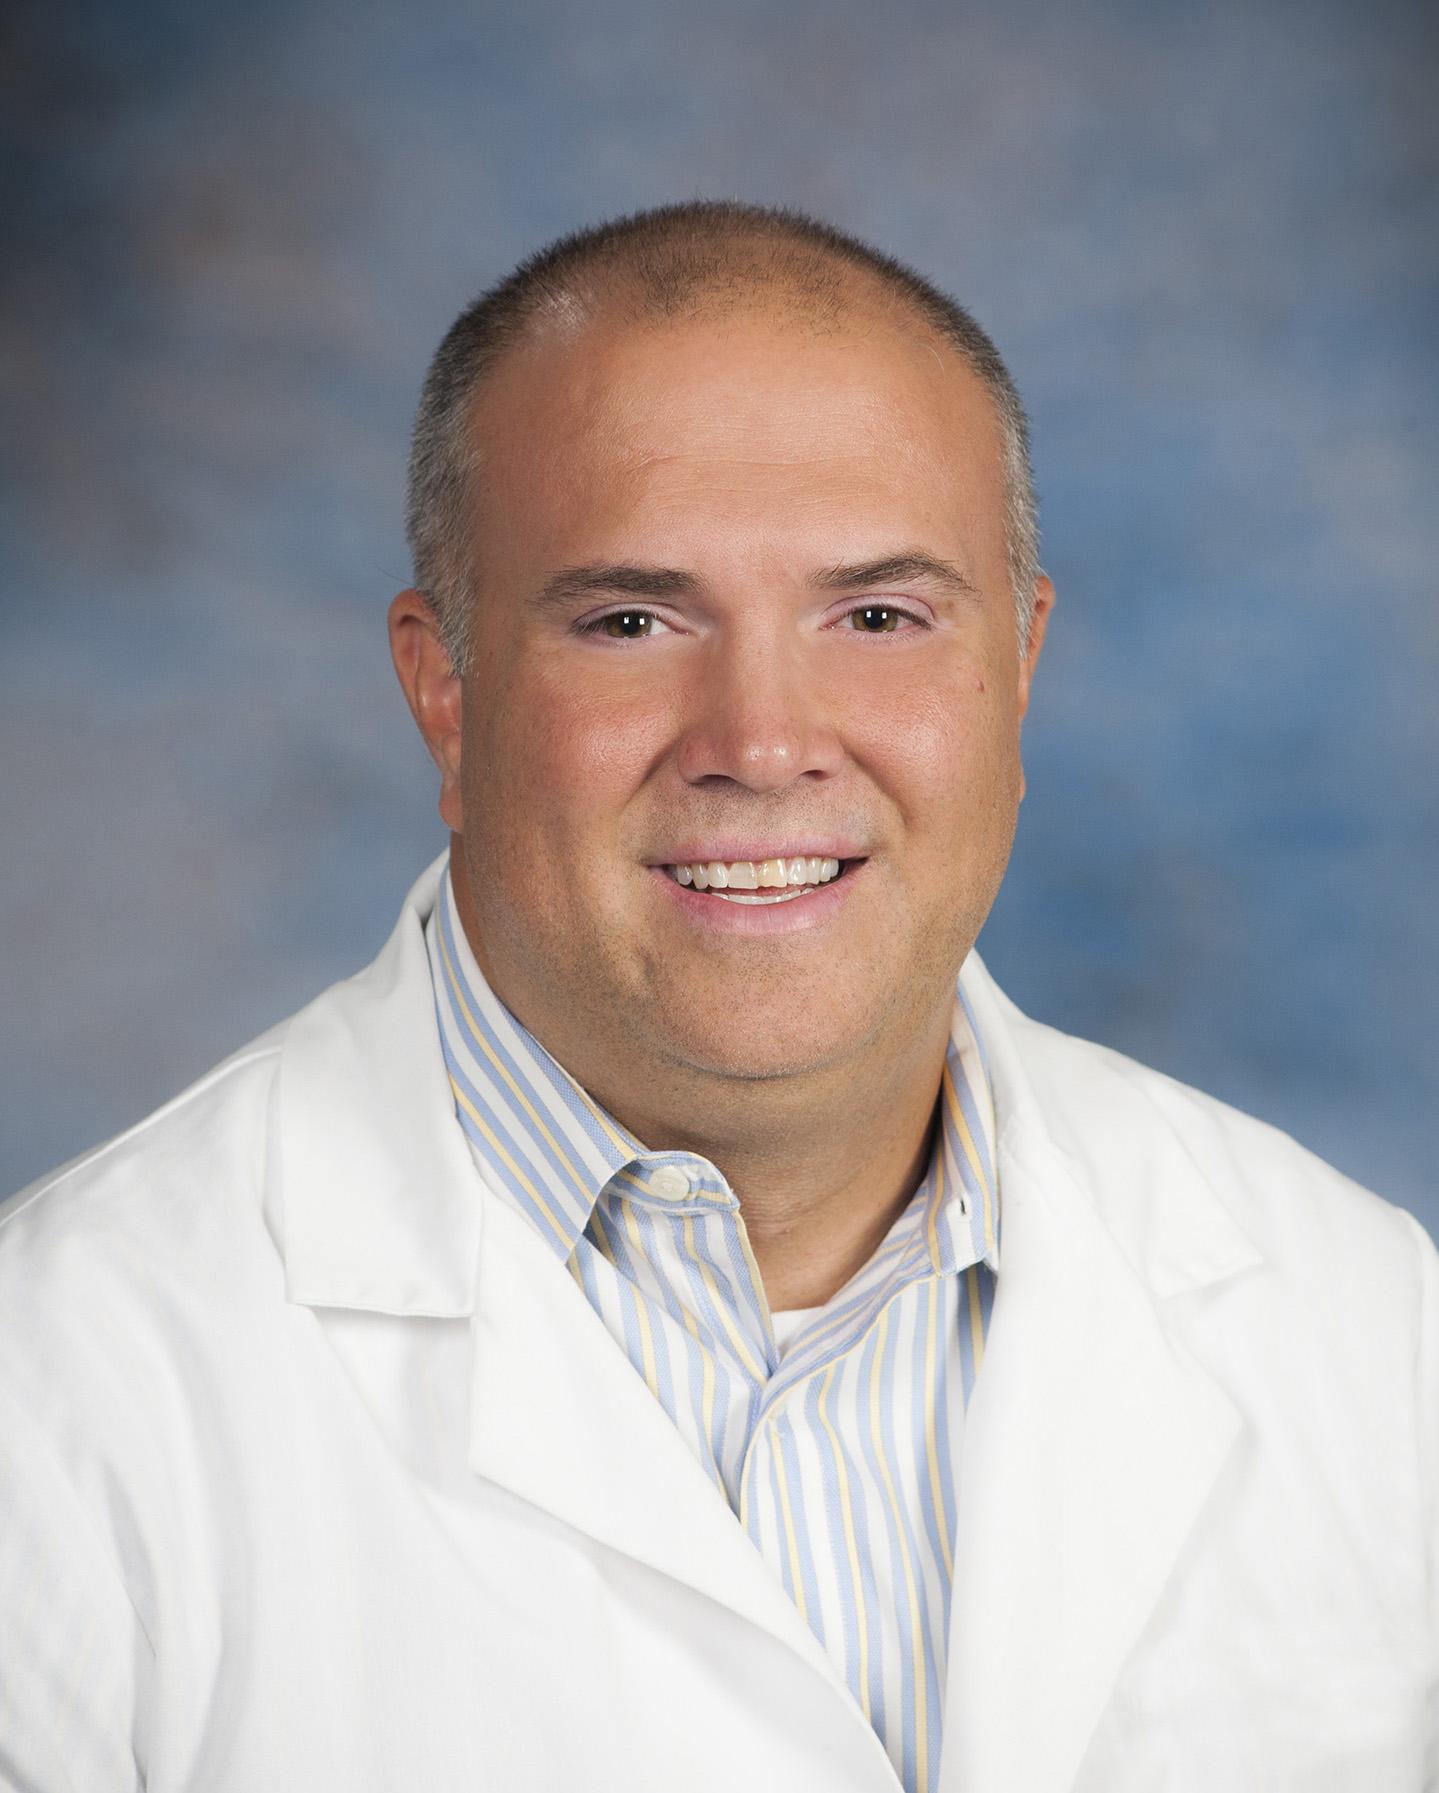 Dr. Skelley New.jpg